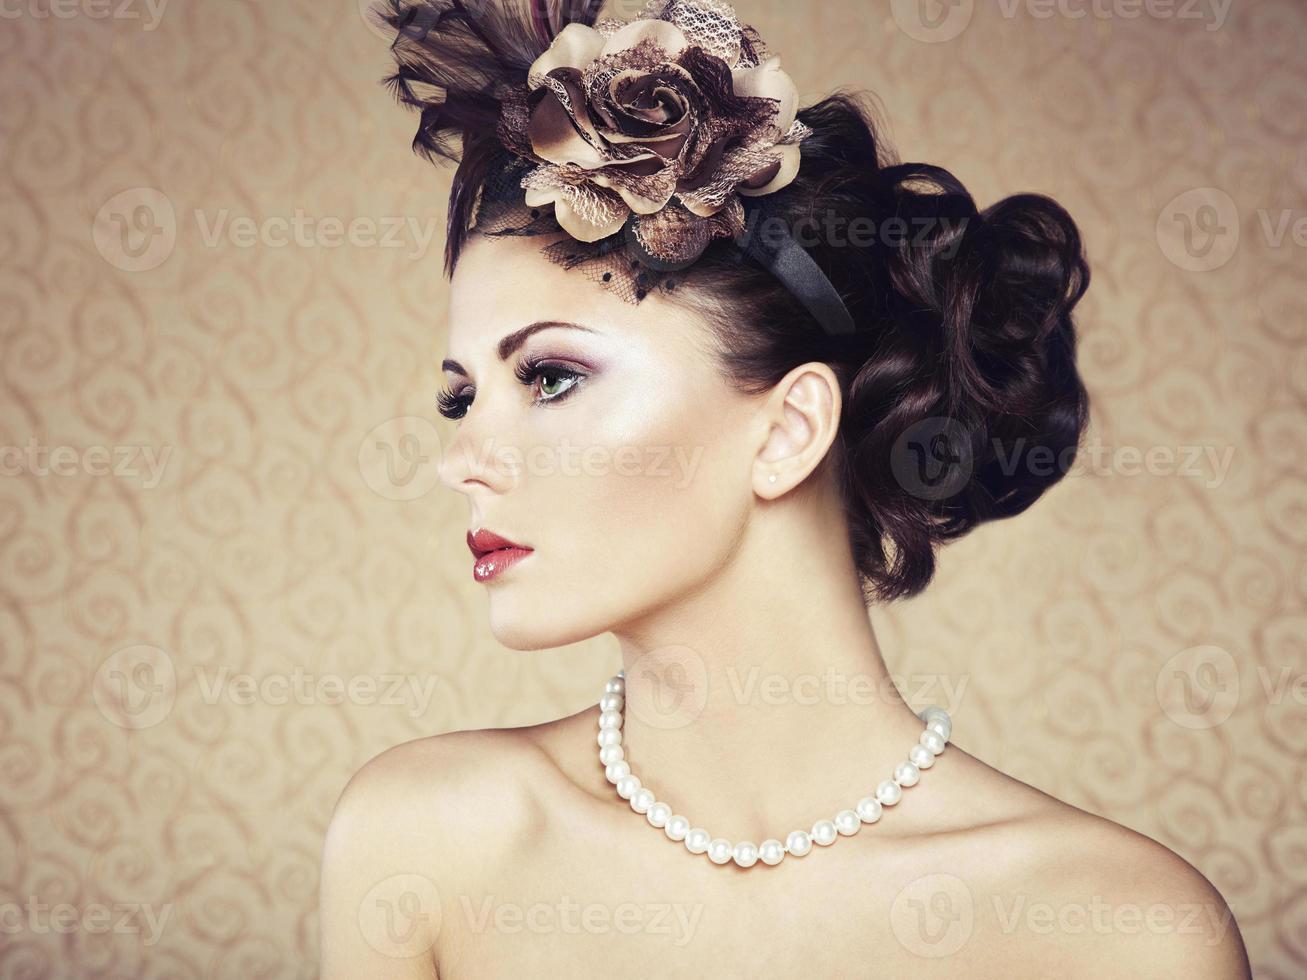 retro portret van mooie vrouw. vintage-stijl foto